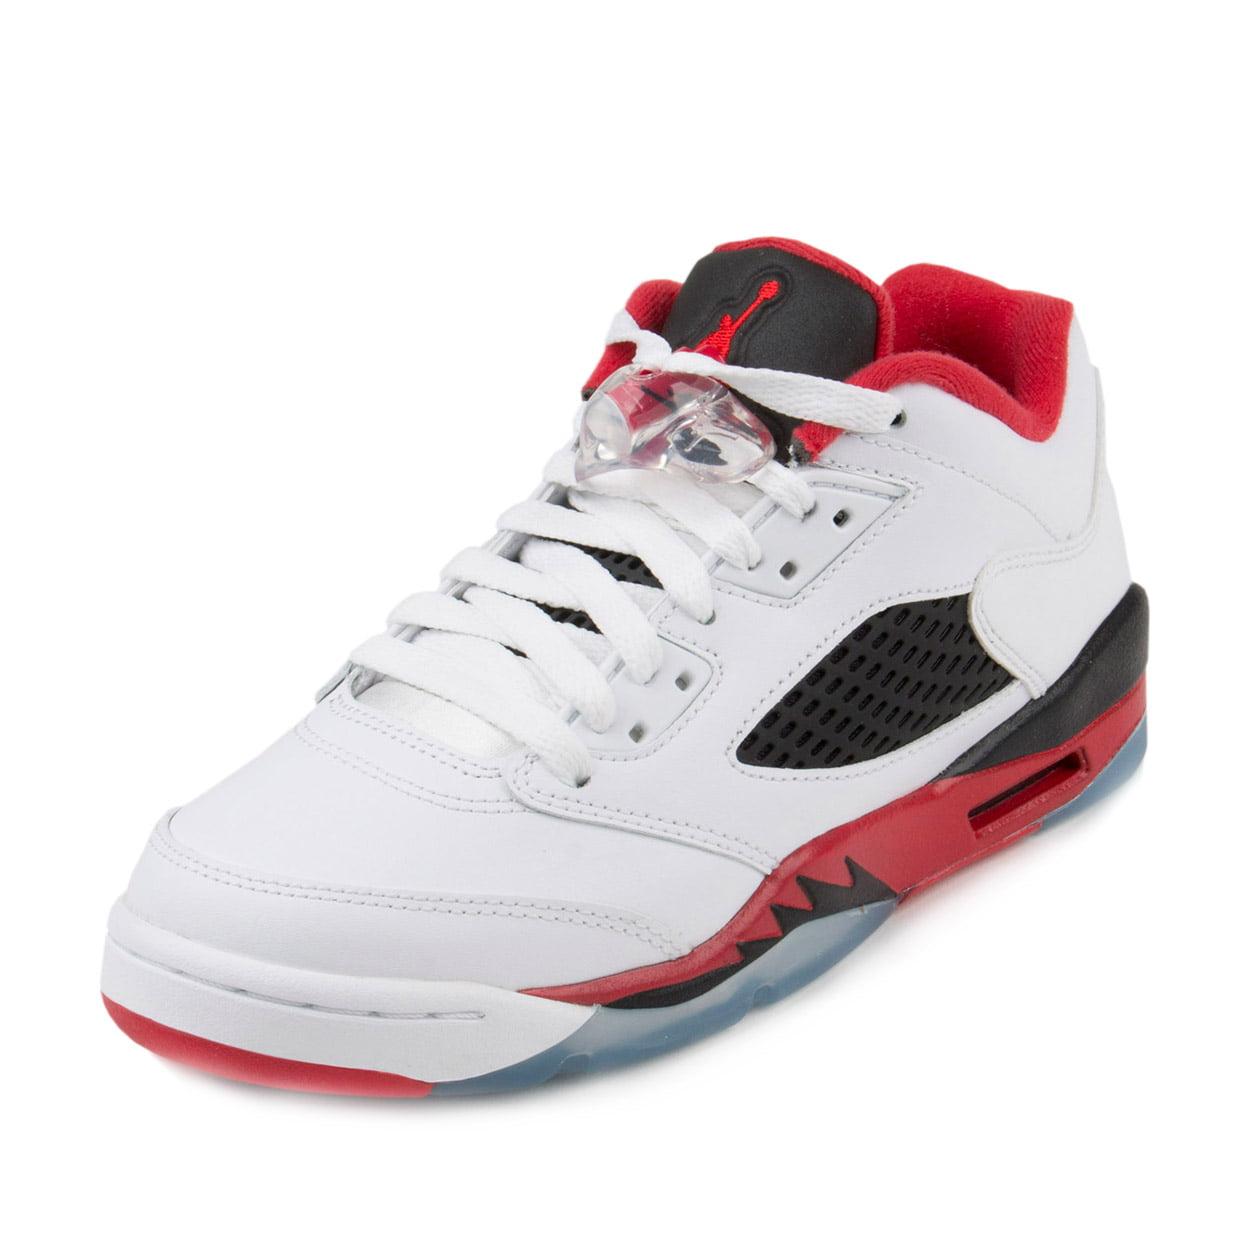 Nike Boys Air Jordan 5 Retro Low (GS